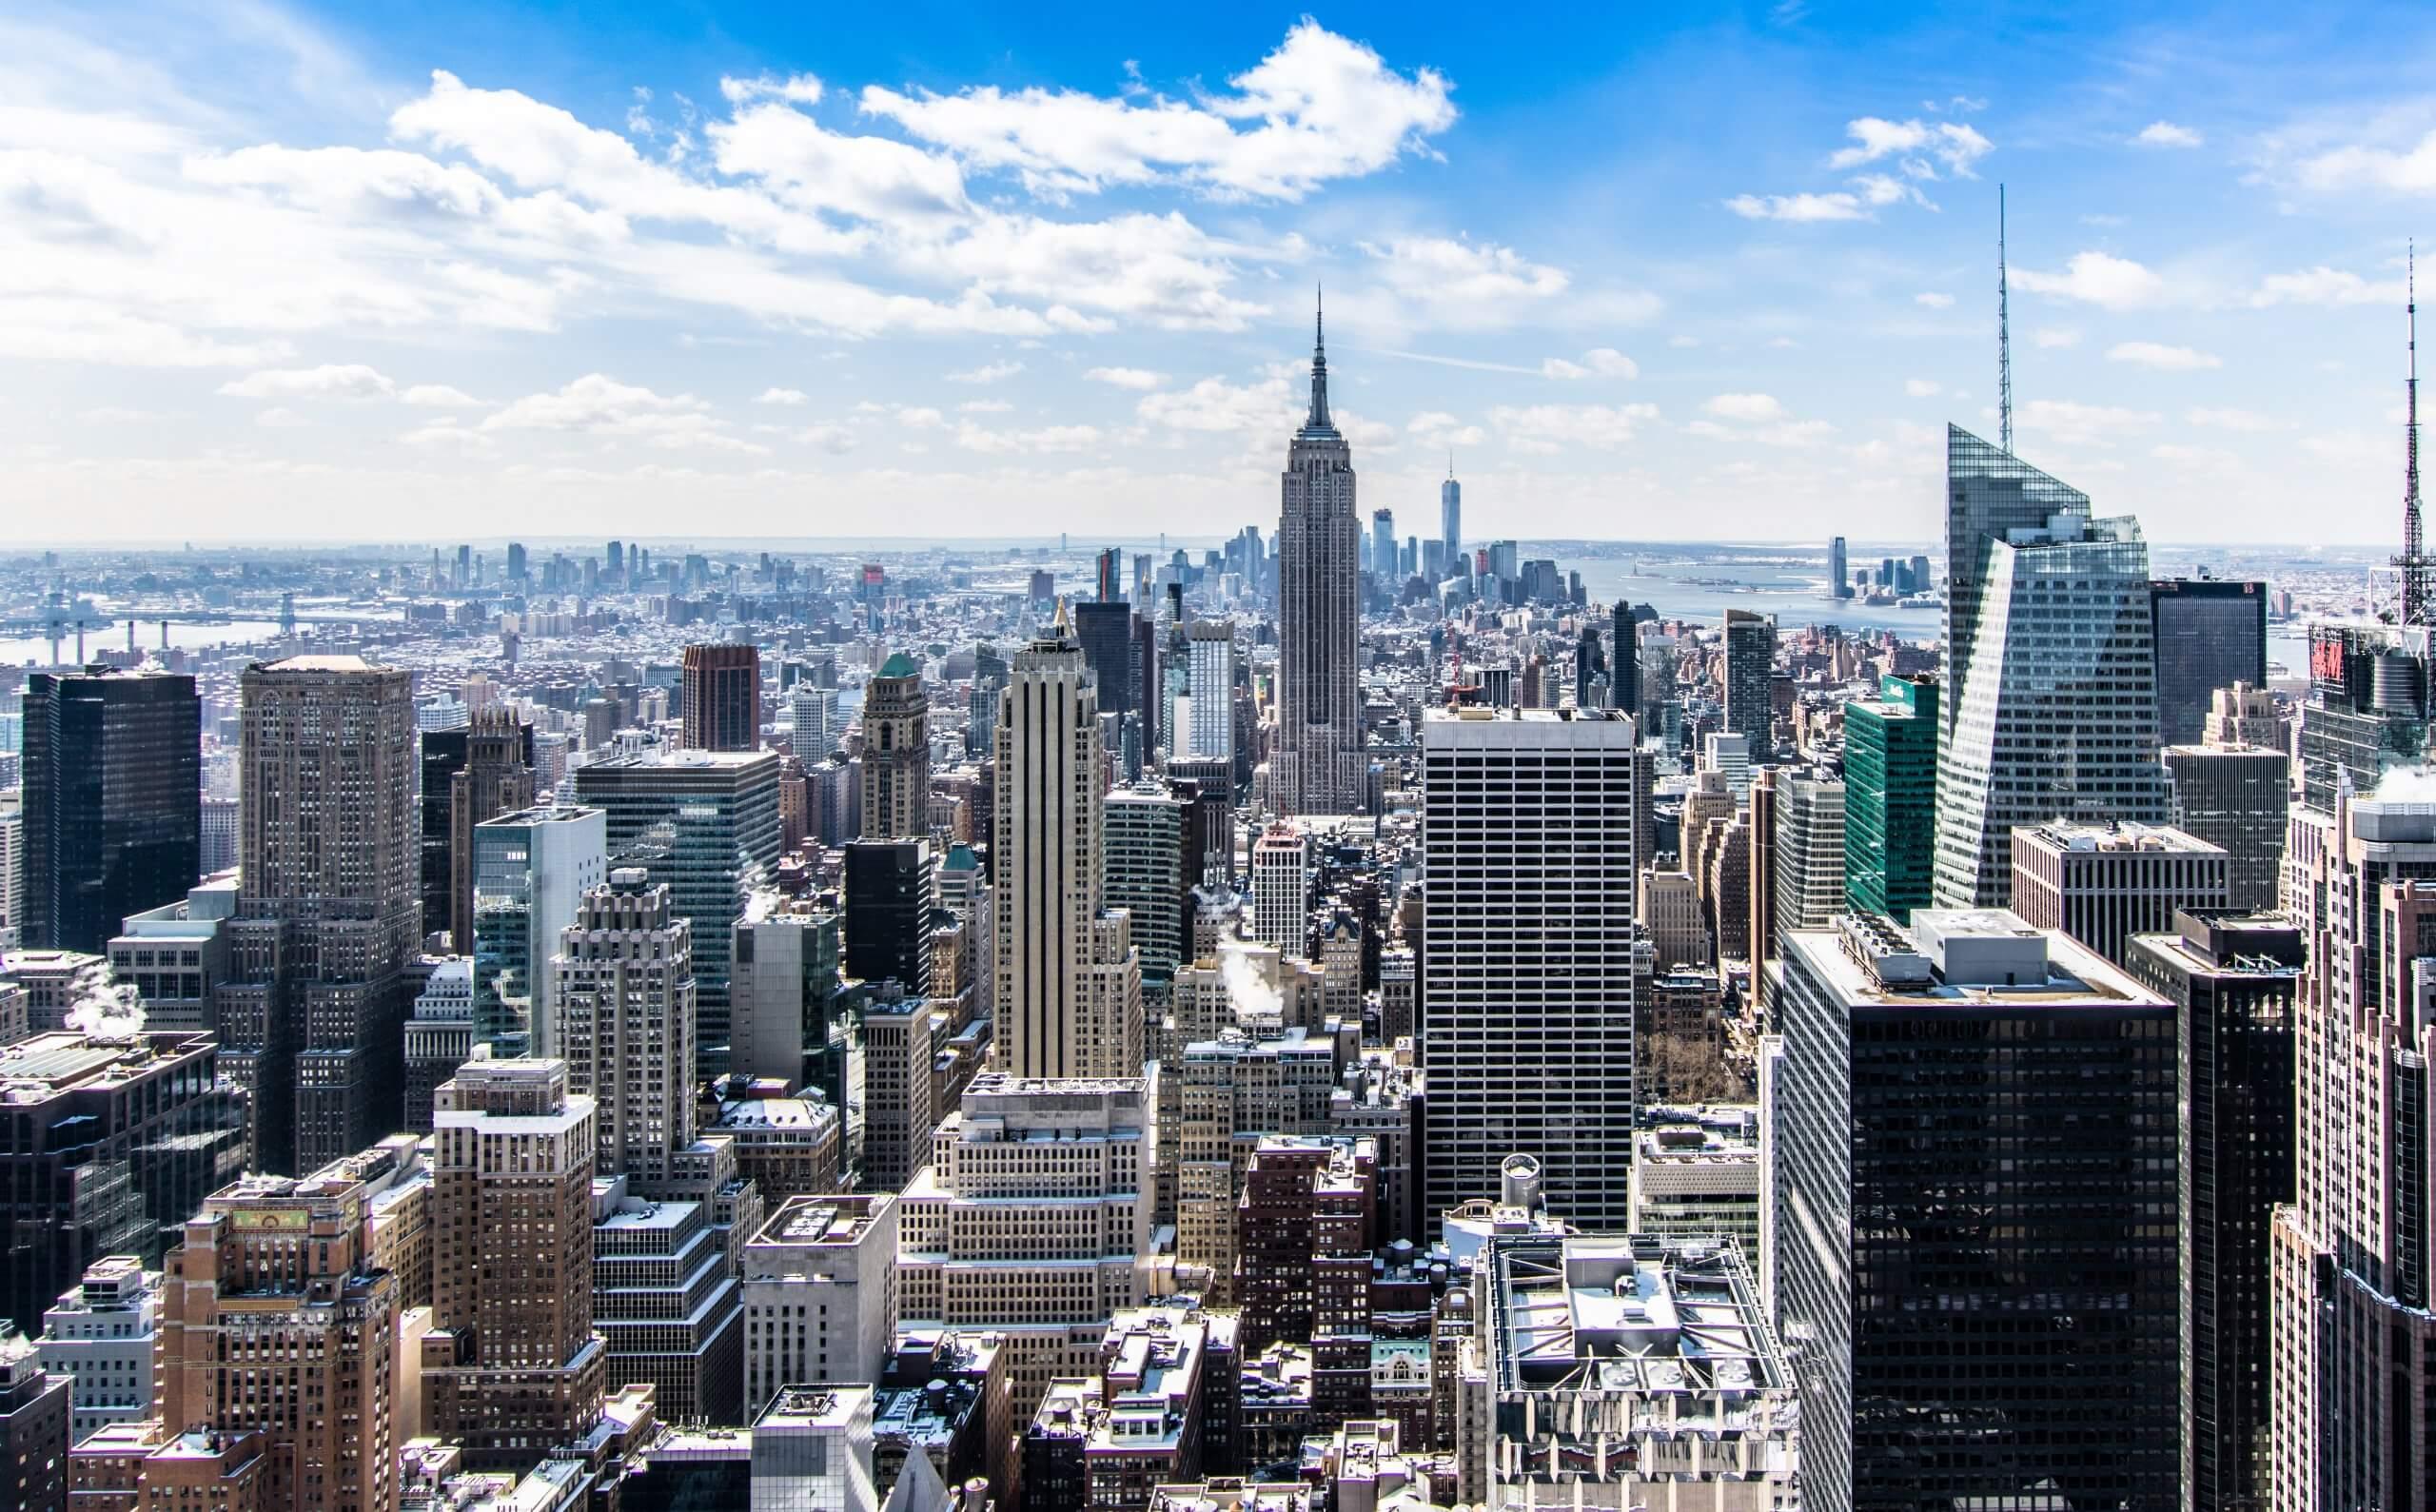 COVID-19, Buildings, UVC light, disinfecting buildings & elevators, skyline entourage